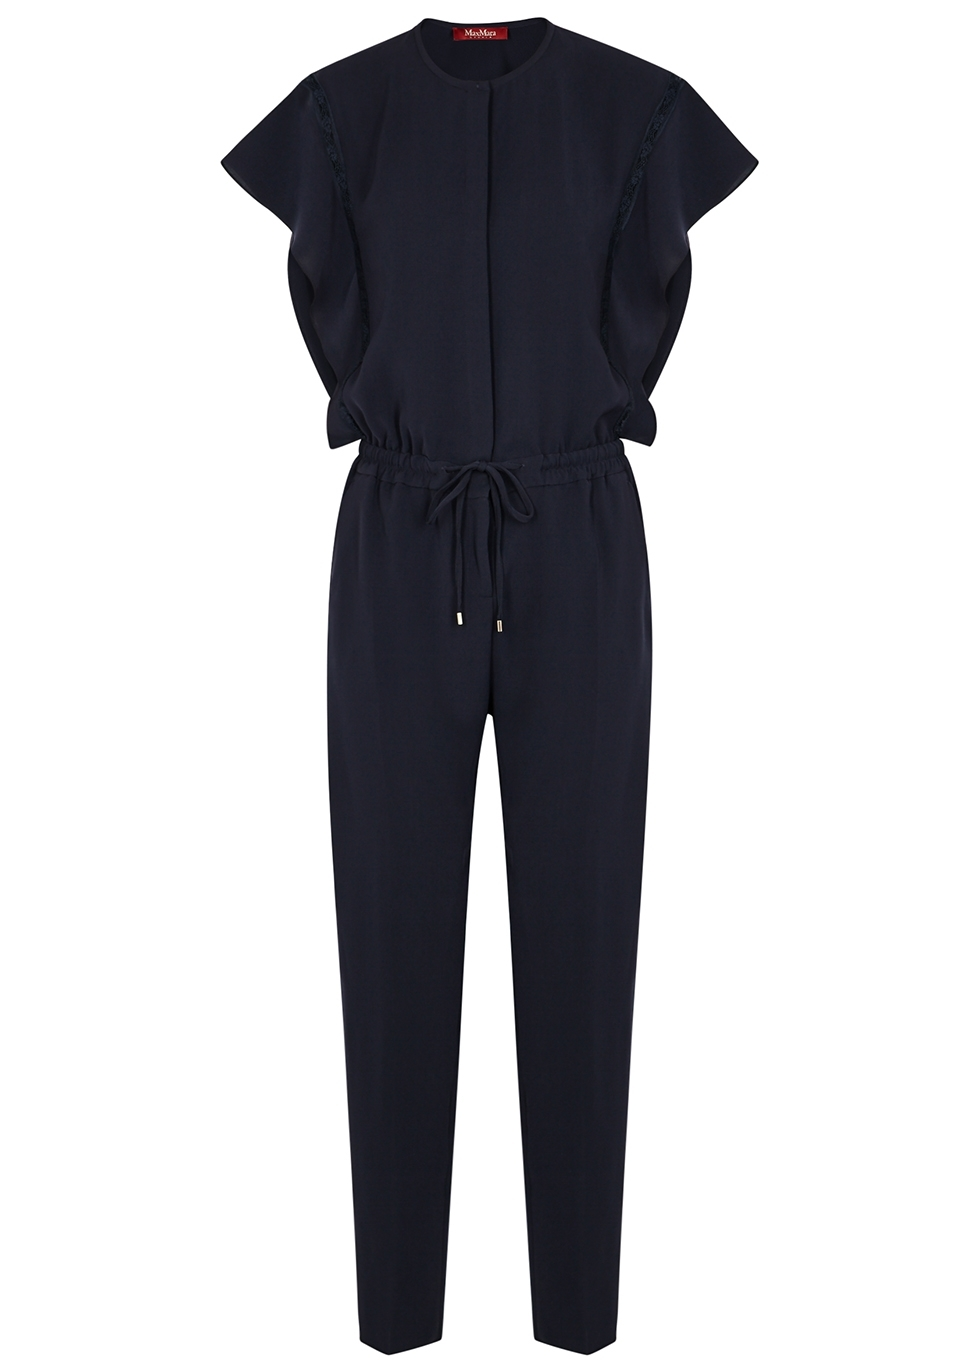 e9c4f4890525 Designer Jumpsuits and Luxury Playsuits - Harvey Nichols